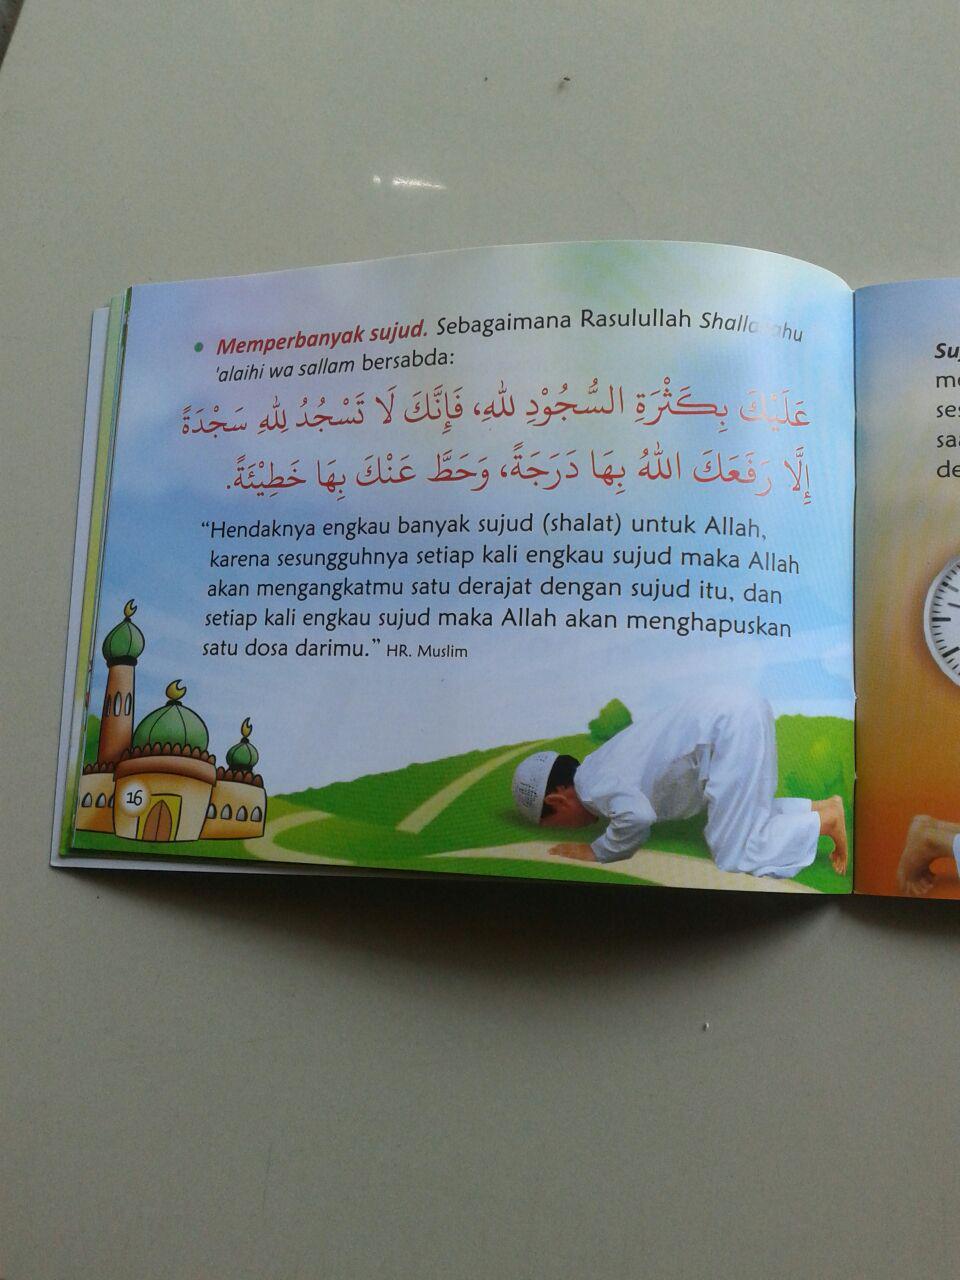 Buku Saku Anak Wahai Adik Adik Cintailah Allah Ta'ala isi